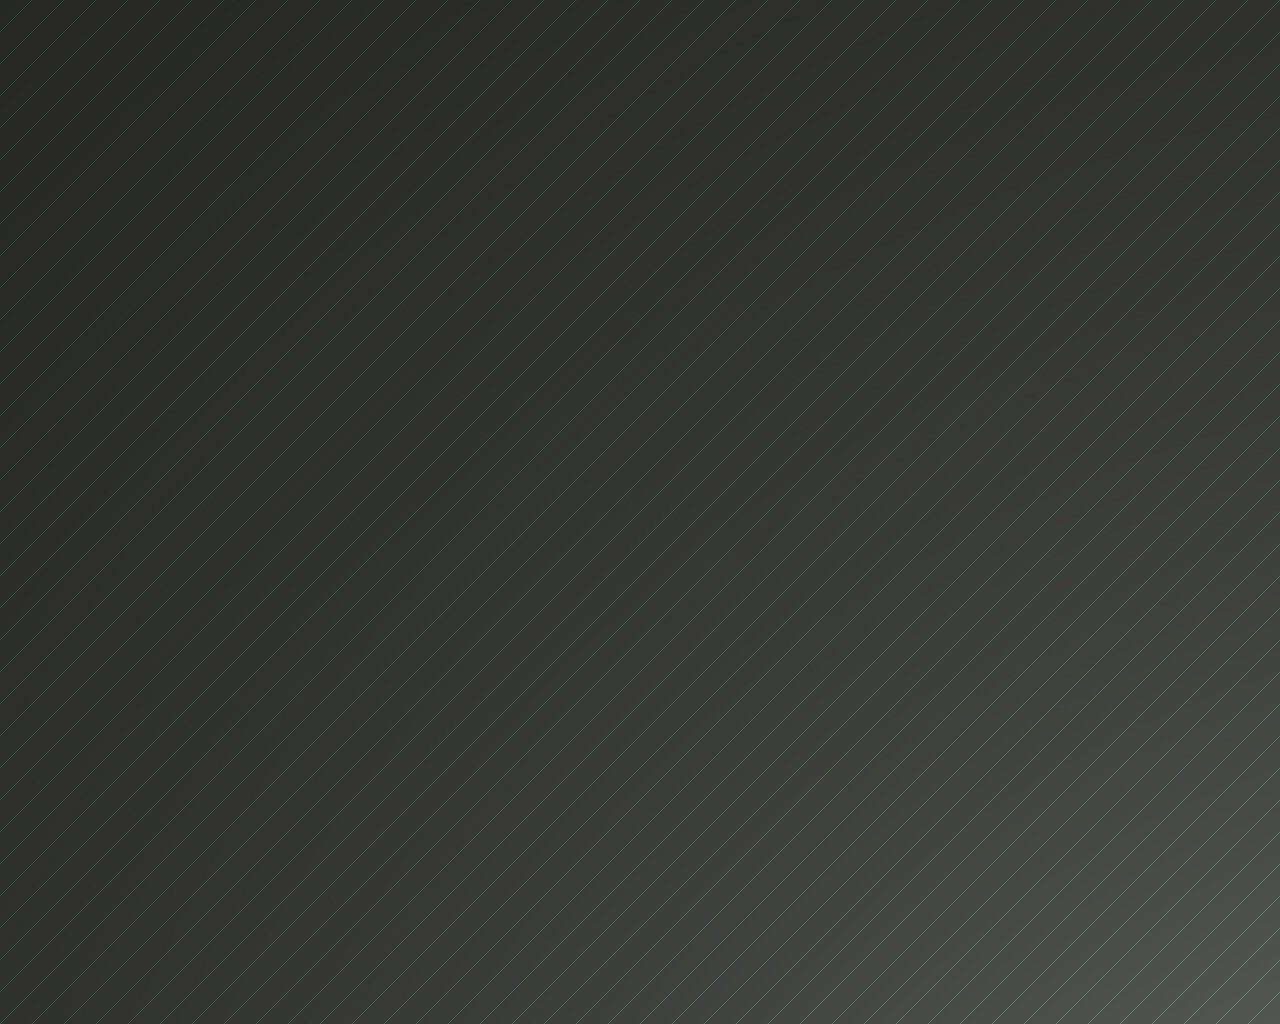 Patrón - Abstracto  Patrón Grey Fondo de Pantalla